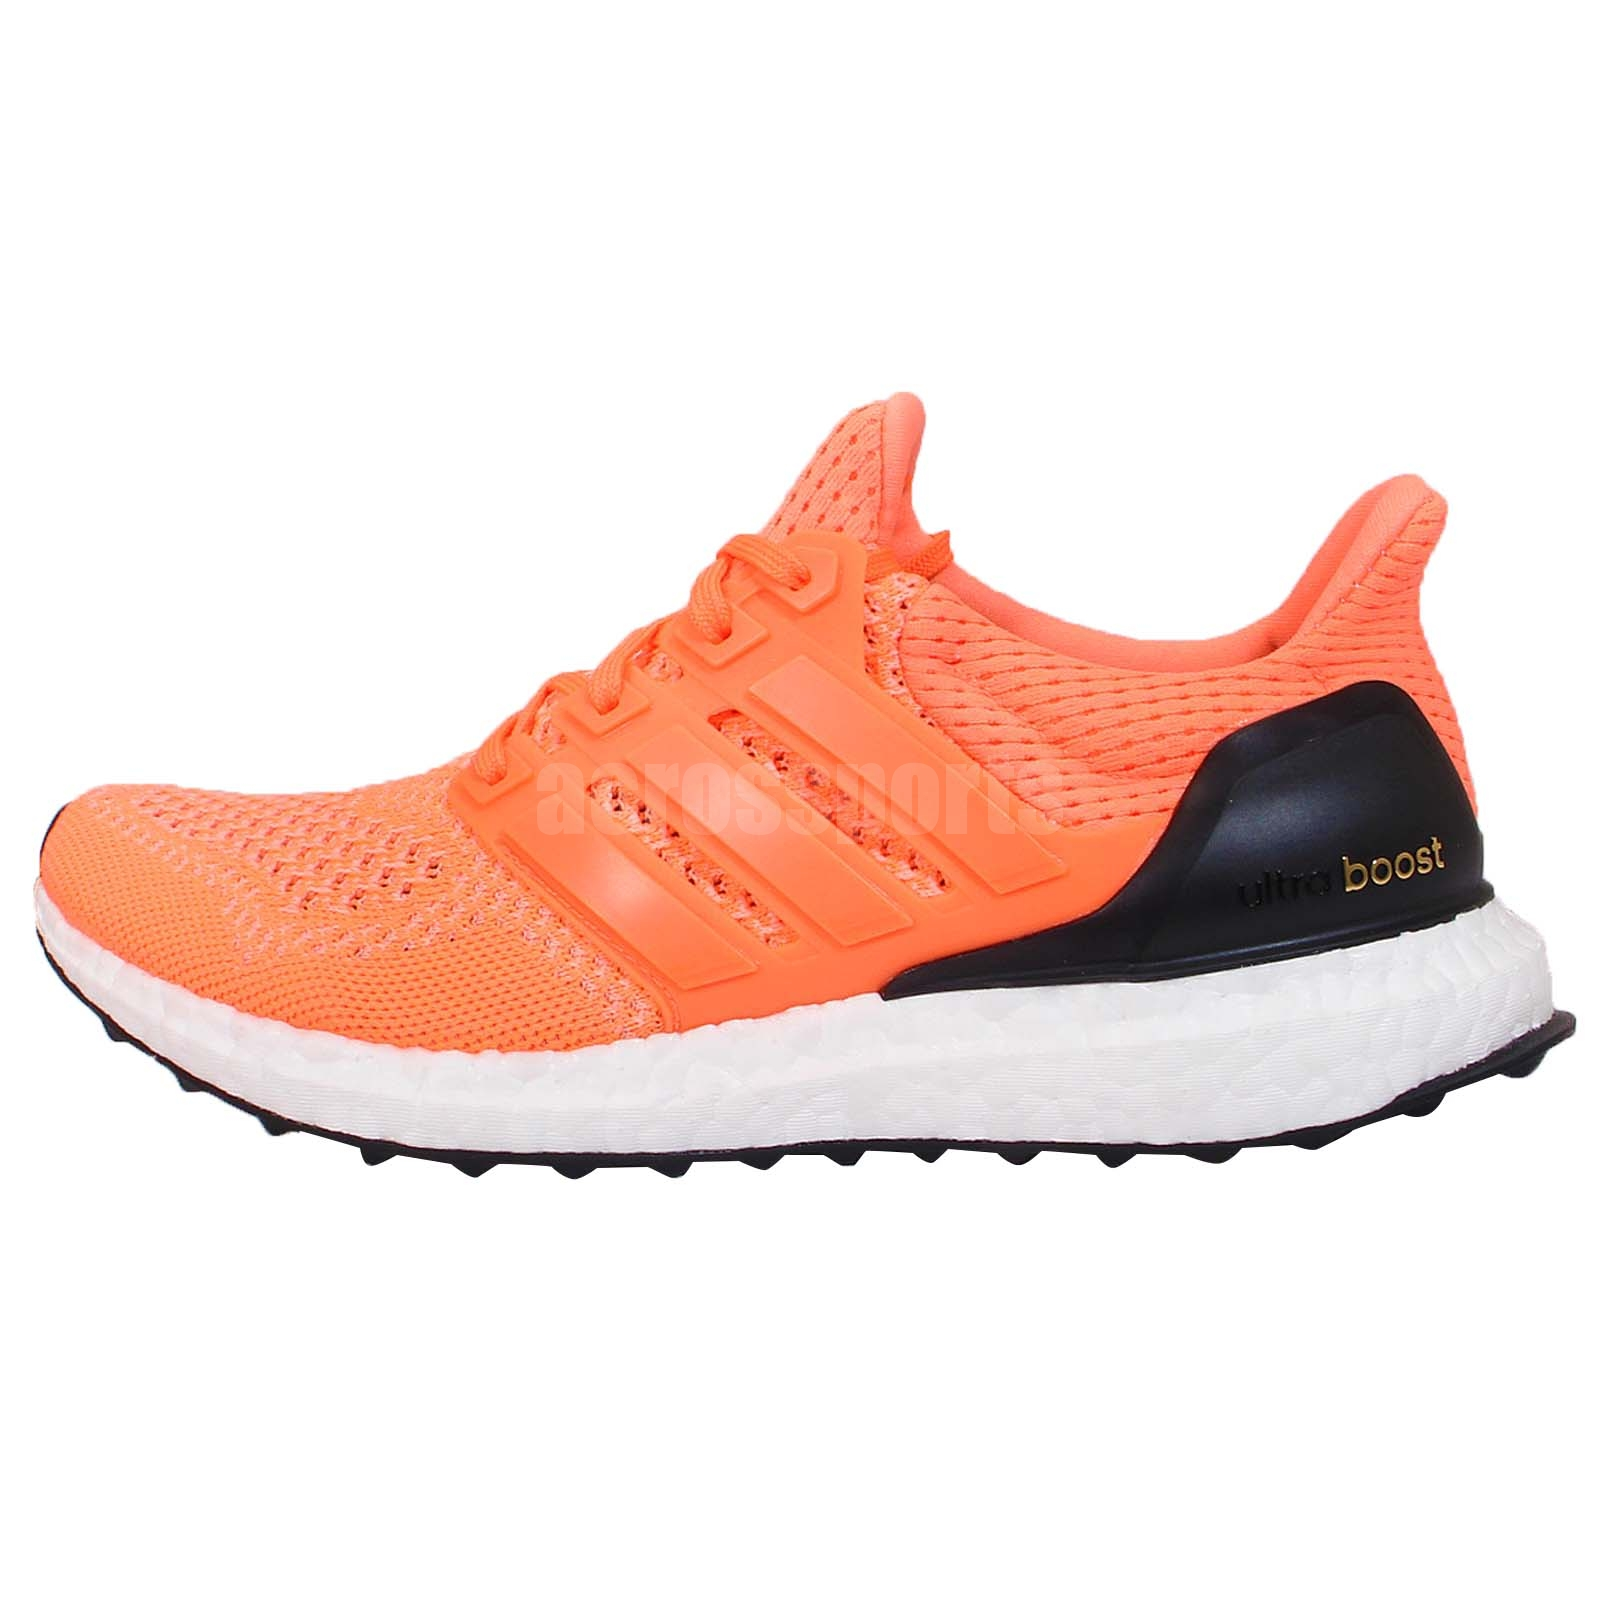 Adidas Ultra Boost Running Shoes Amazon